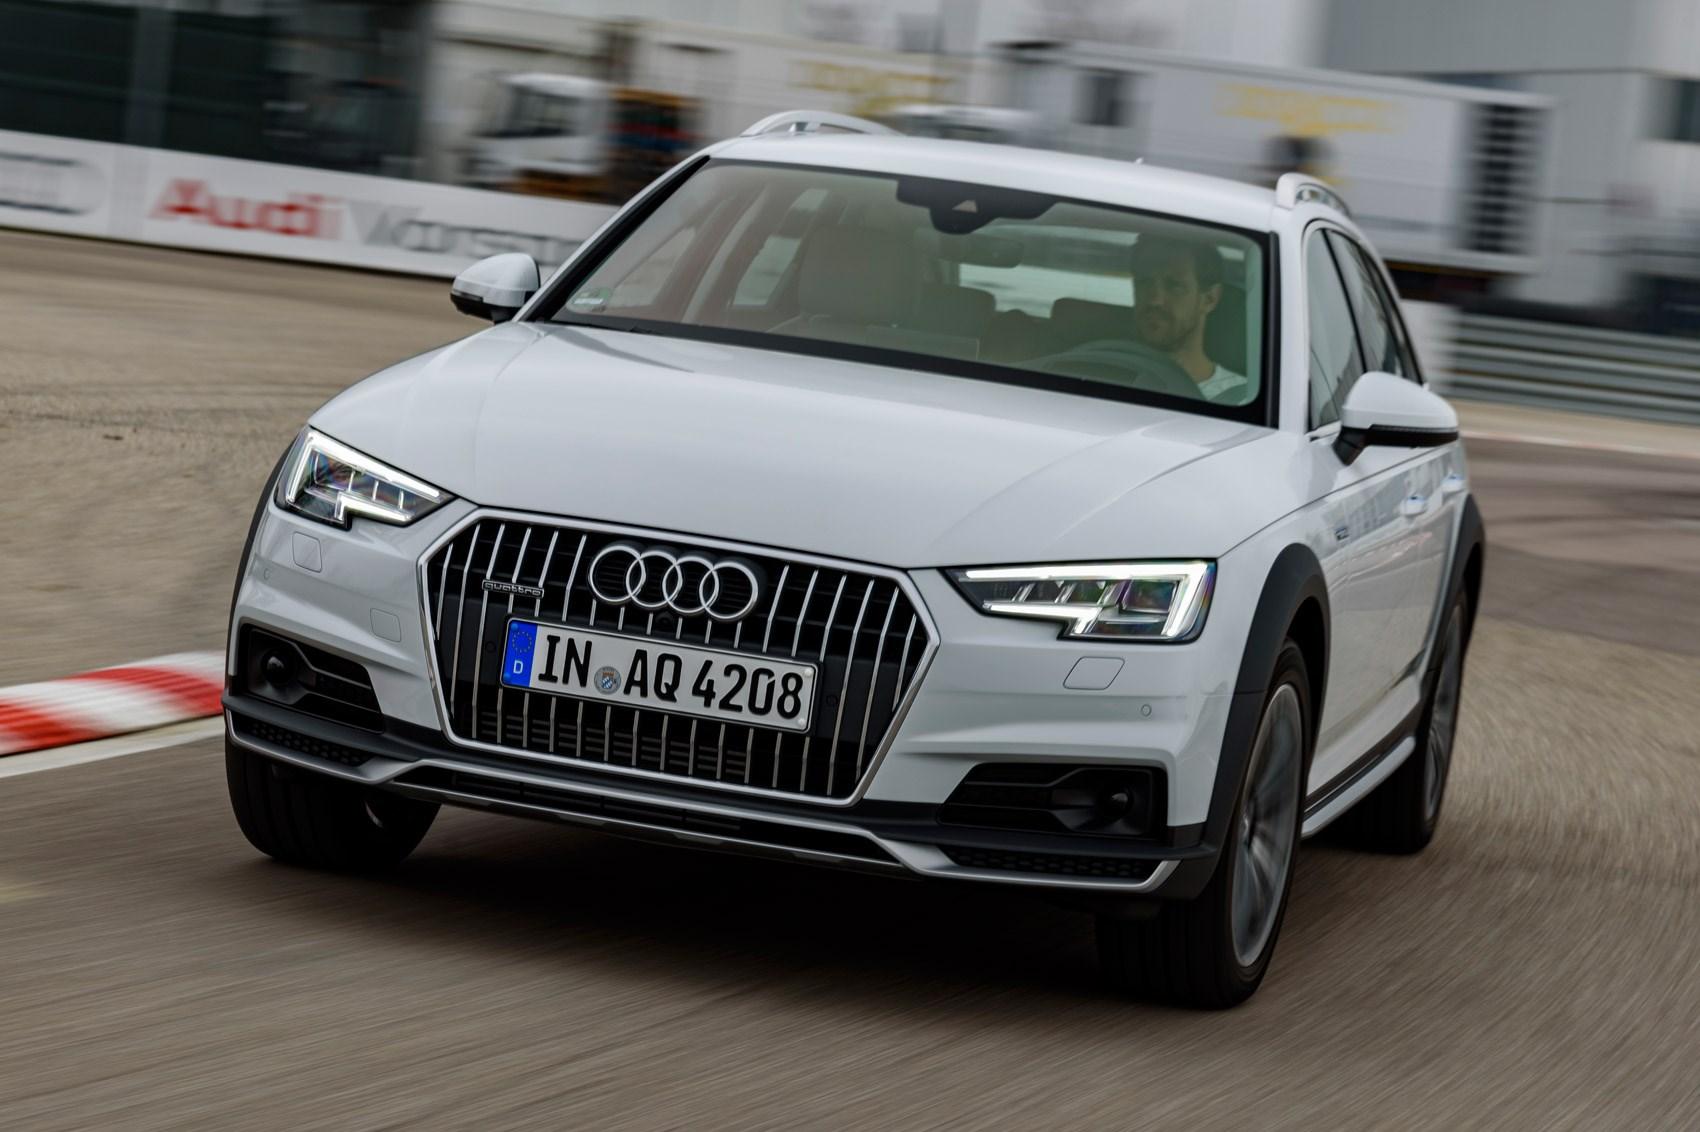 Audi Q7 Car Wallpaper Dieselgate Scoperto Nuovo Cheat Software Su Audi Verde